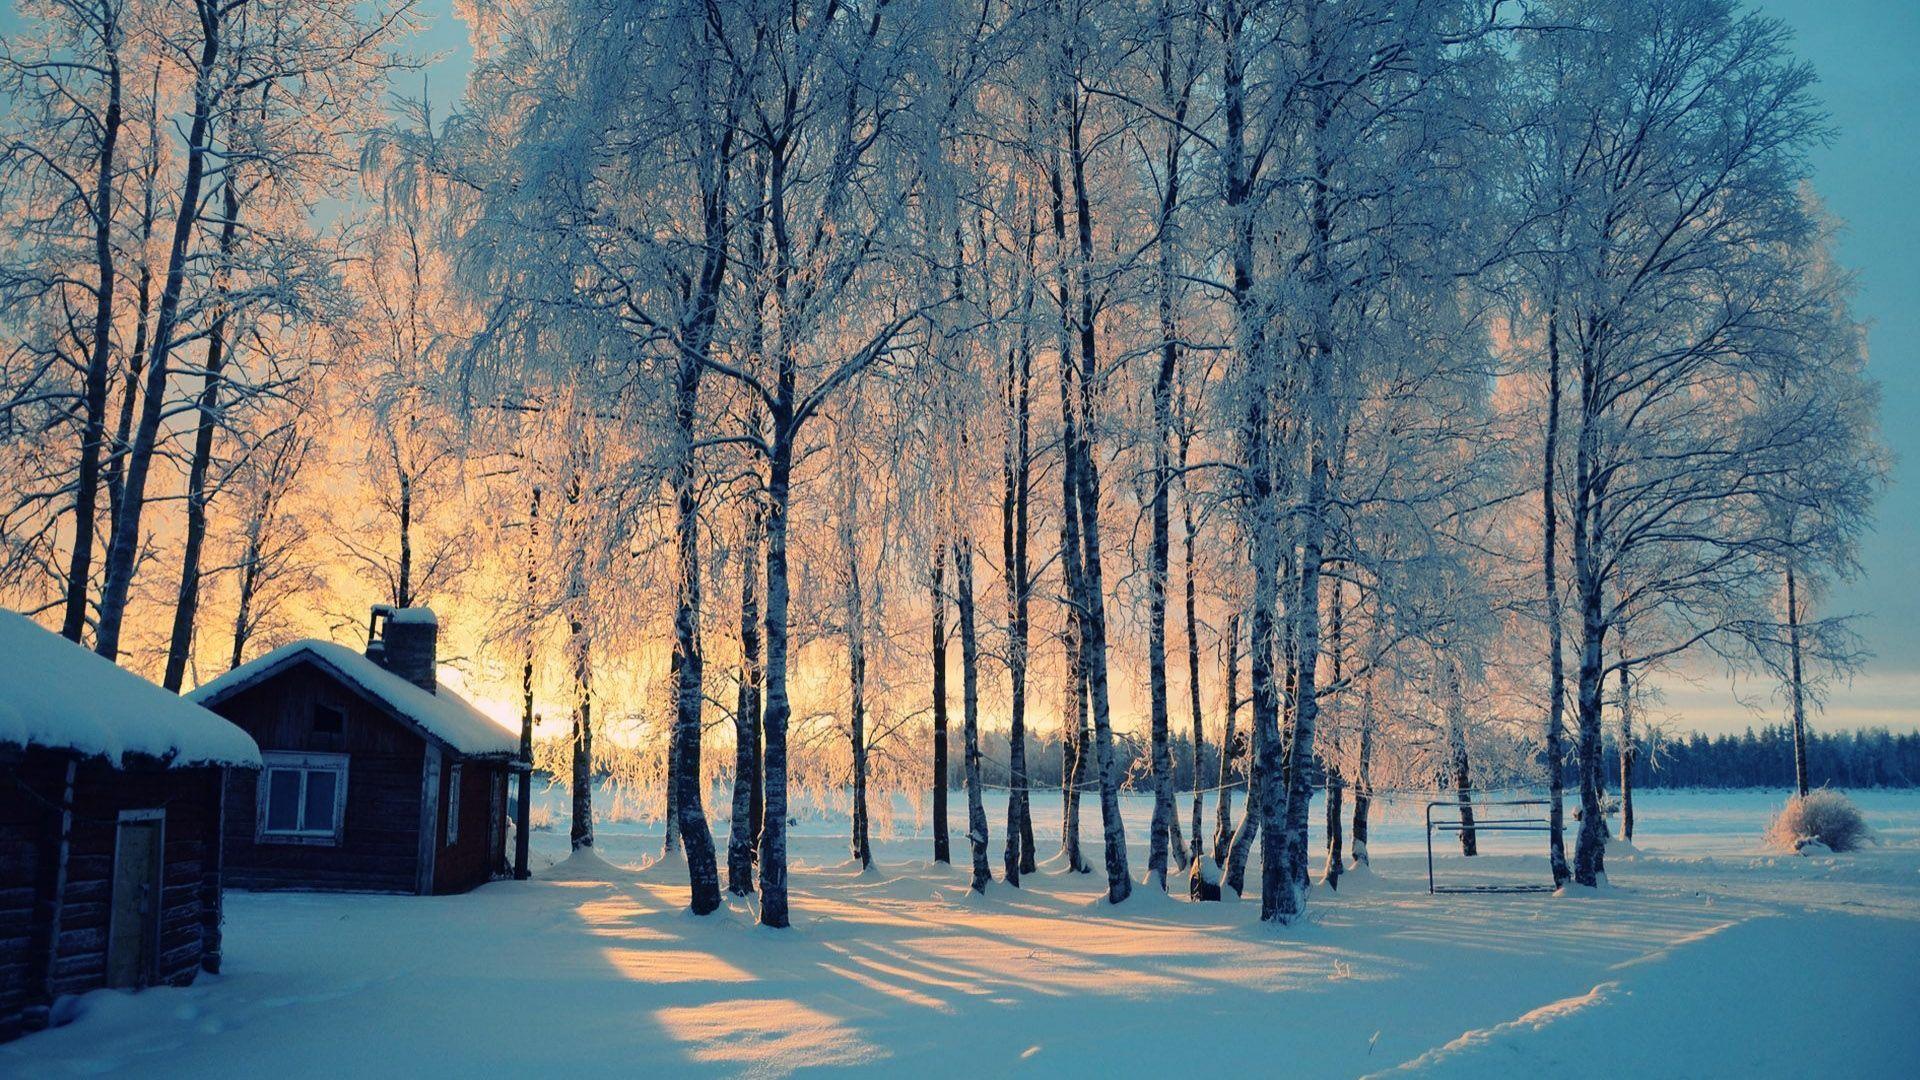 Cute Winter Picture